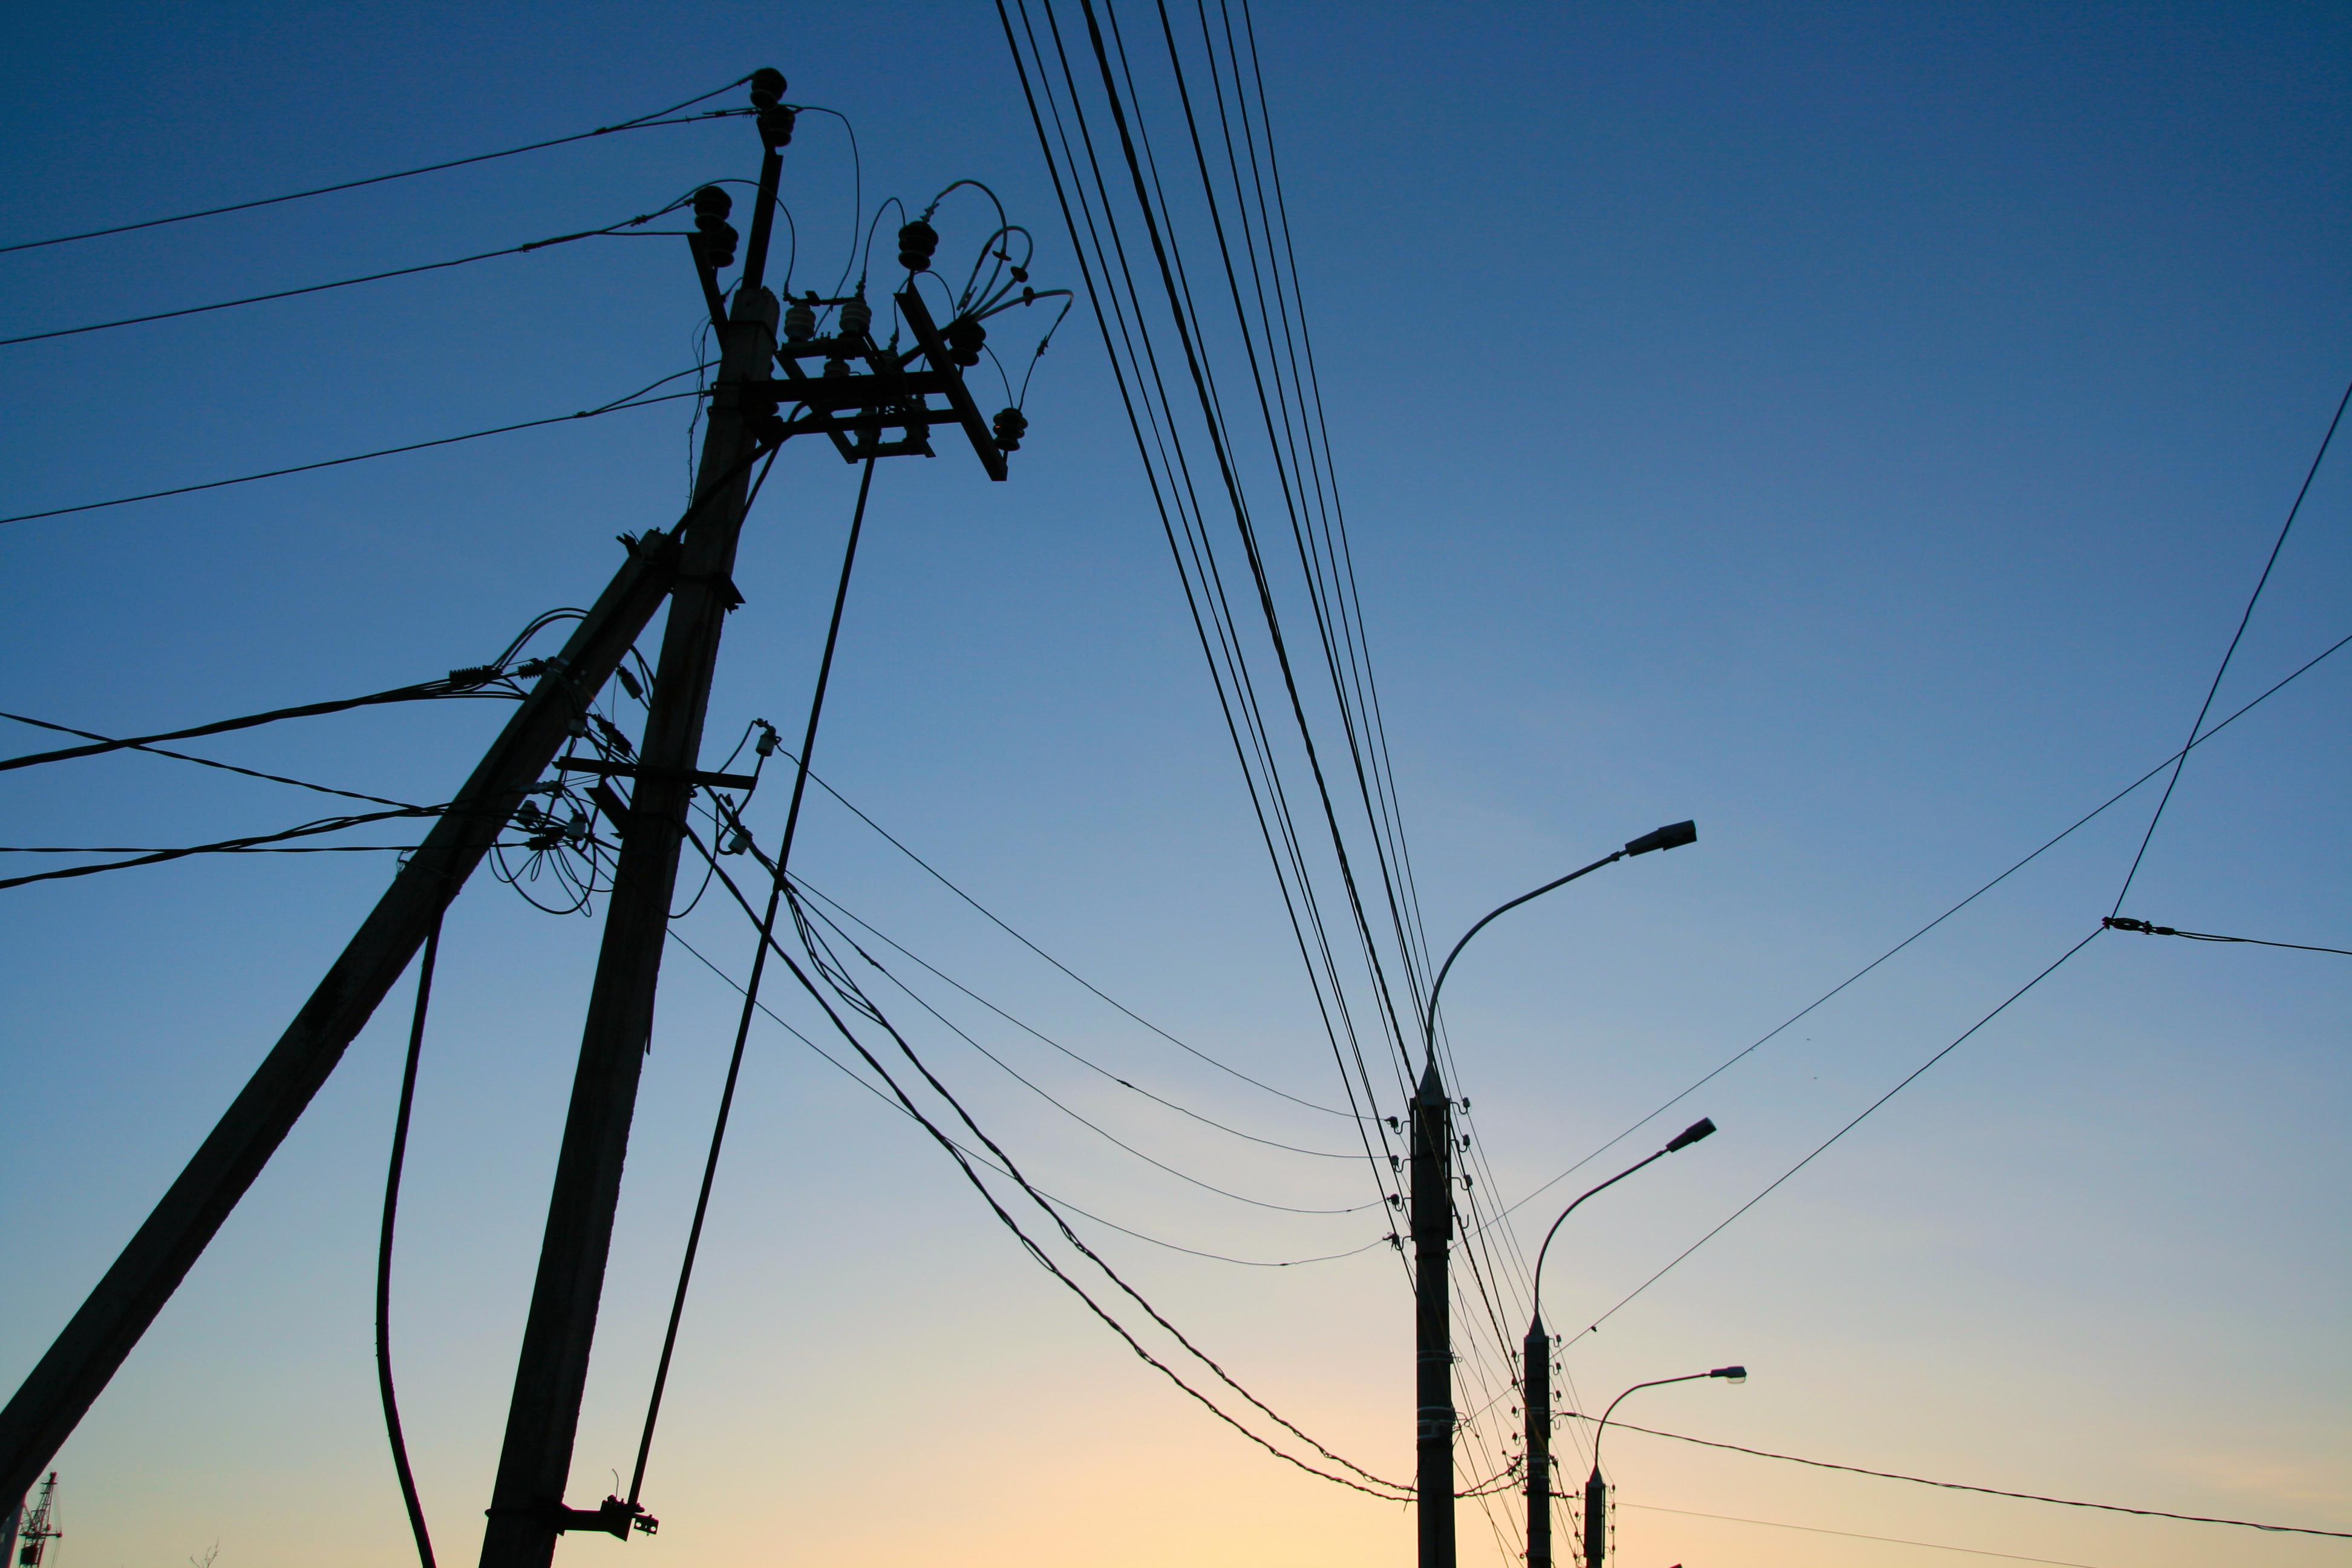 Wires photo